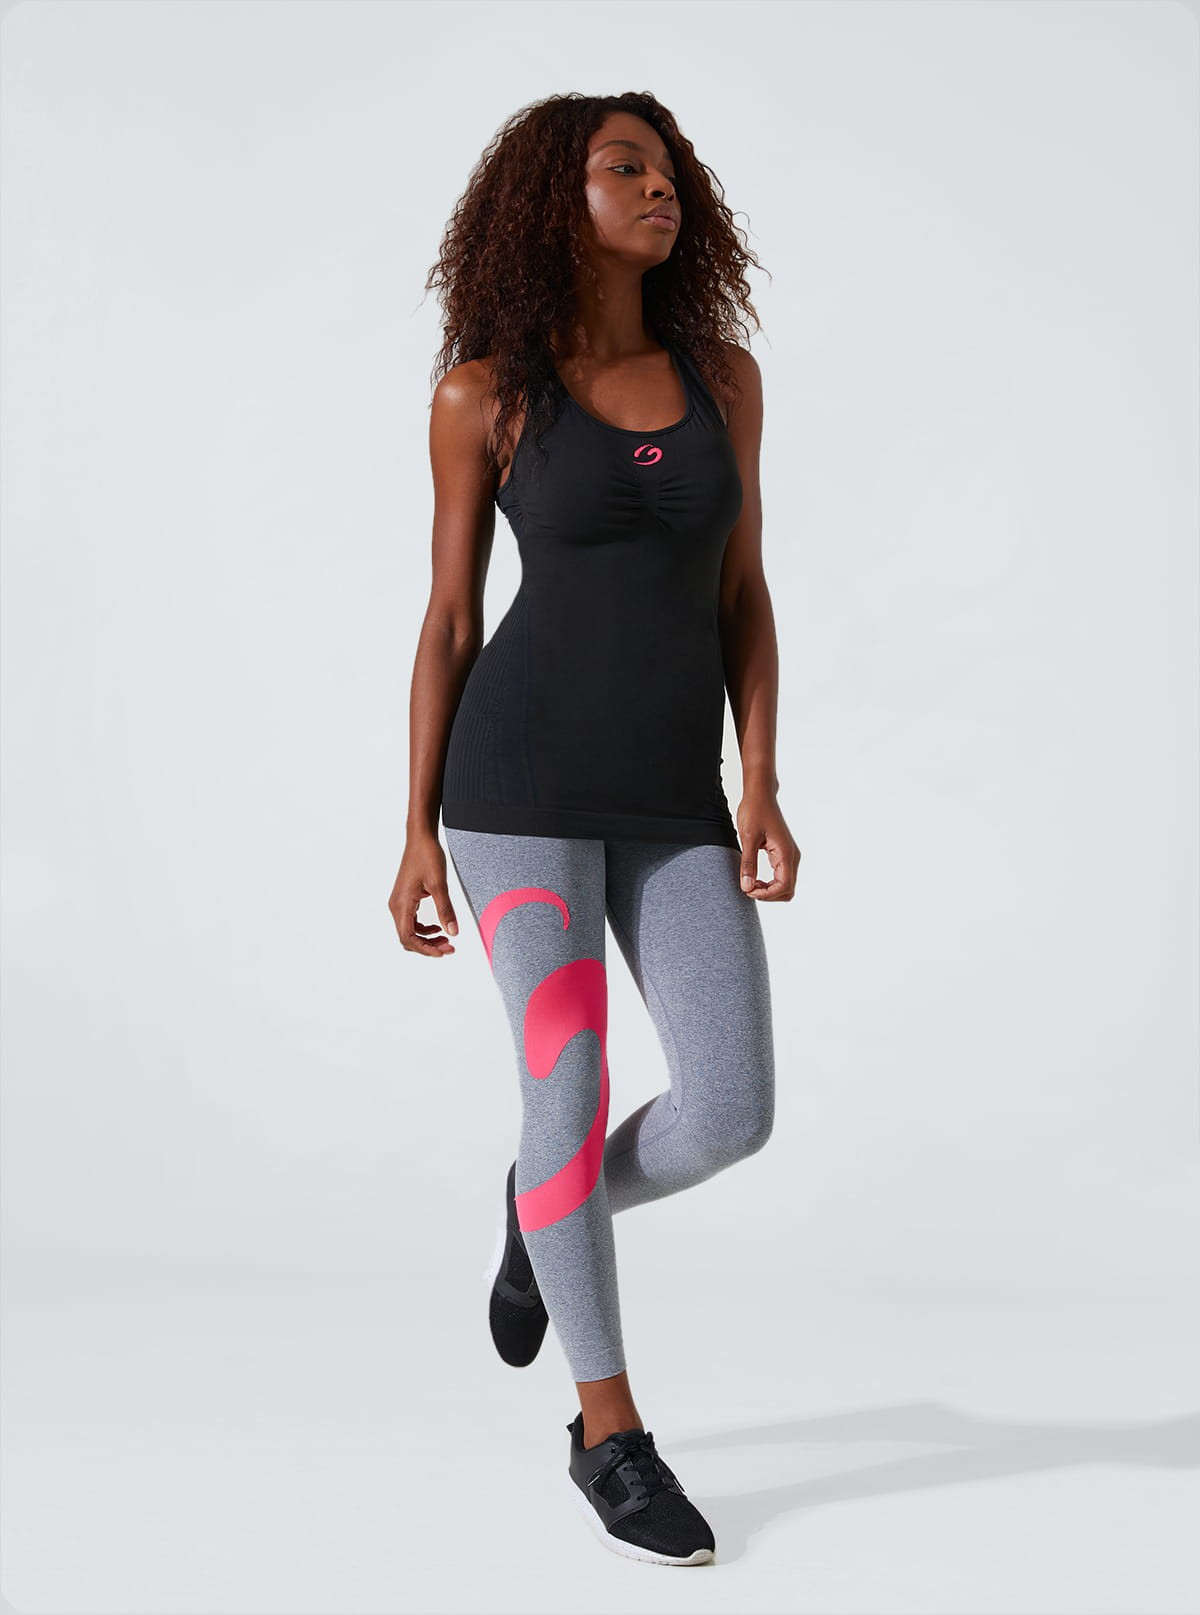 Completo Sport Donna: Canotta vogatore + Legging melange